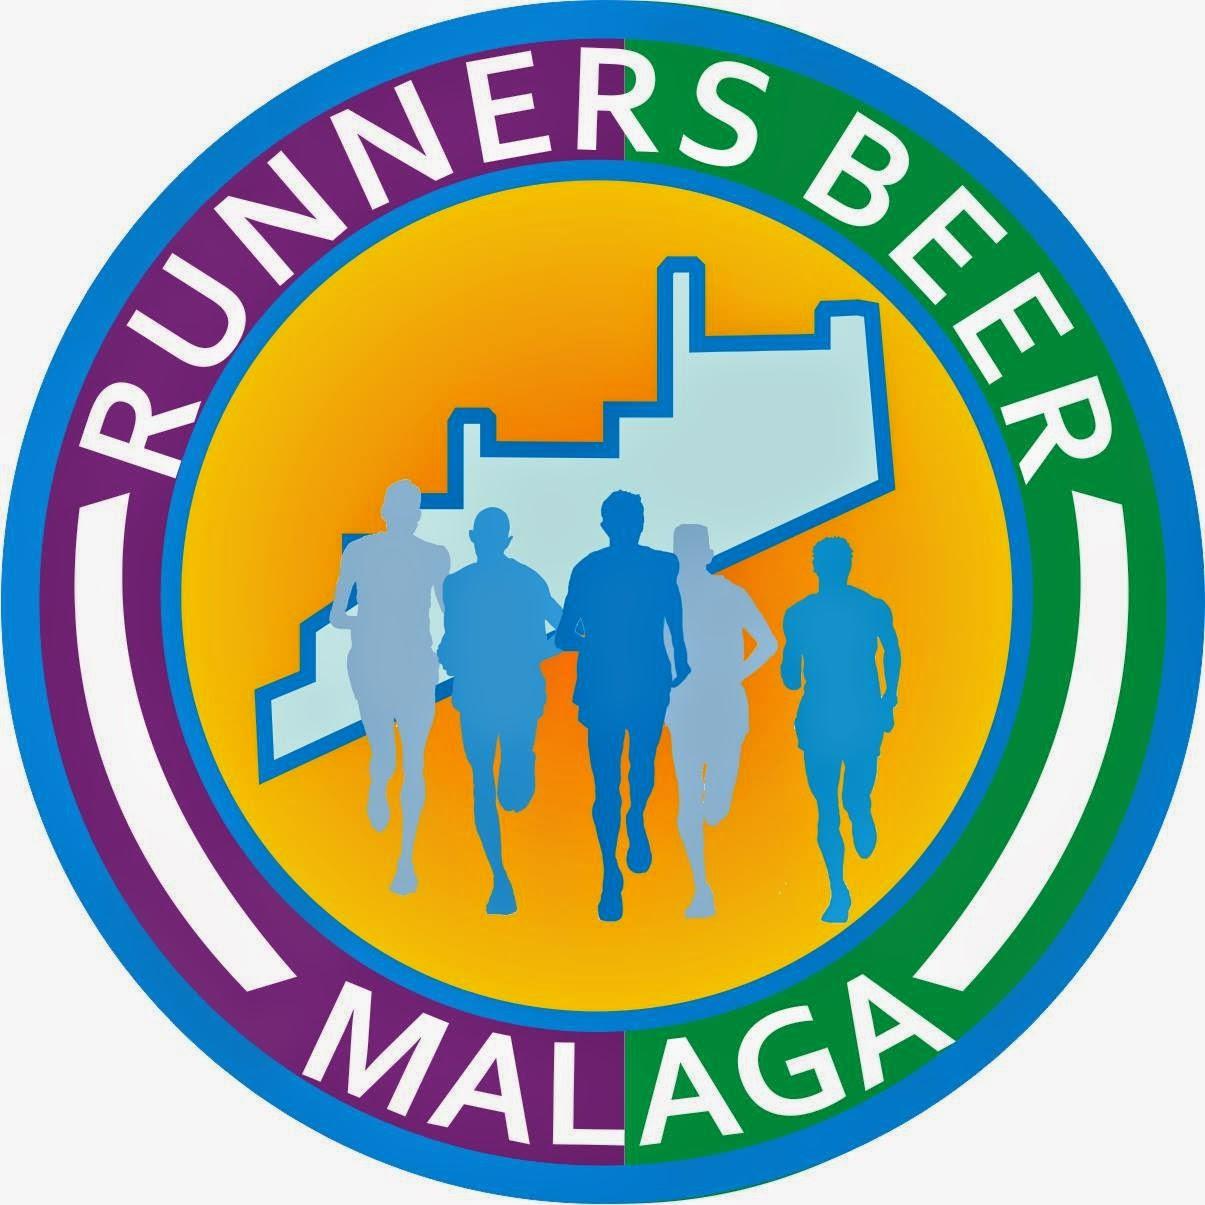 BEER RUNNERS MALAGA ( FACEBOOK )